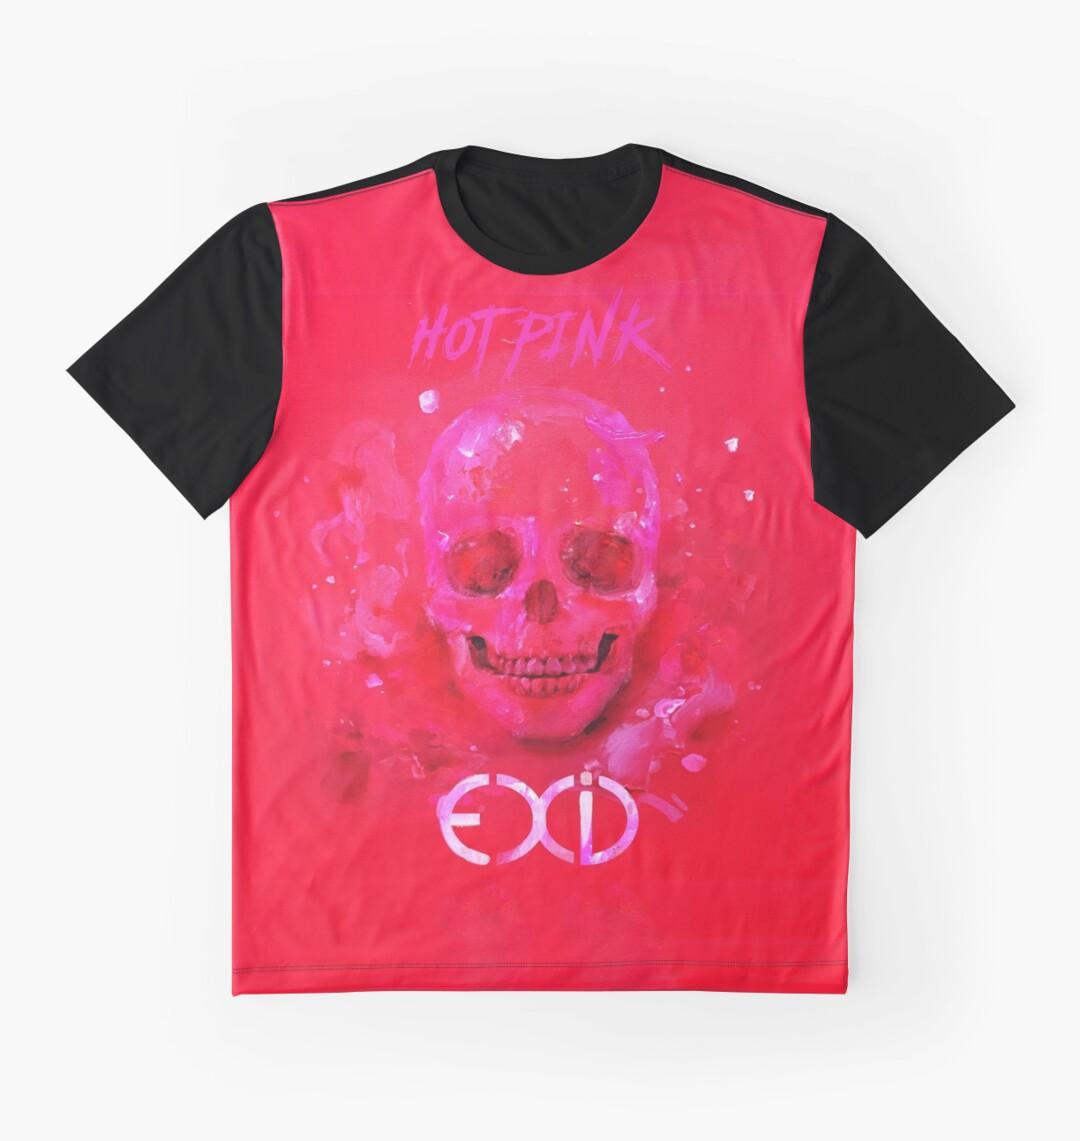 EXID 'HOT PINK'